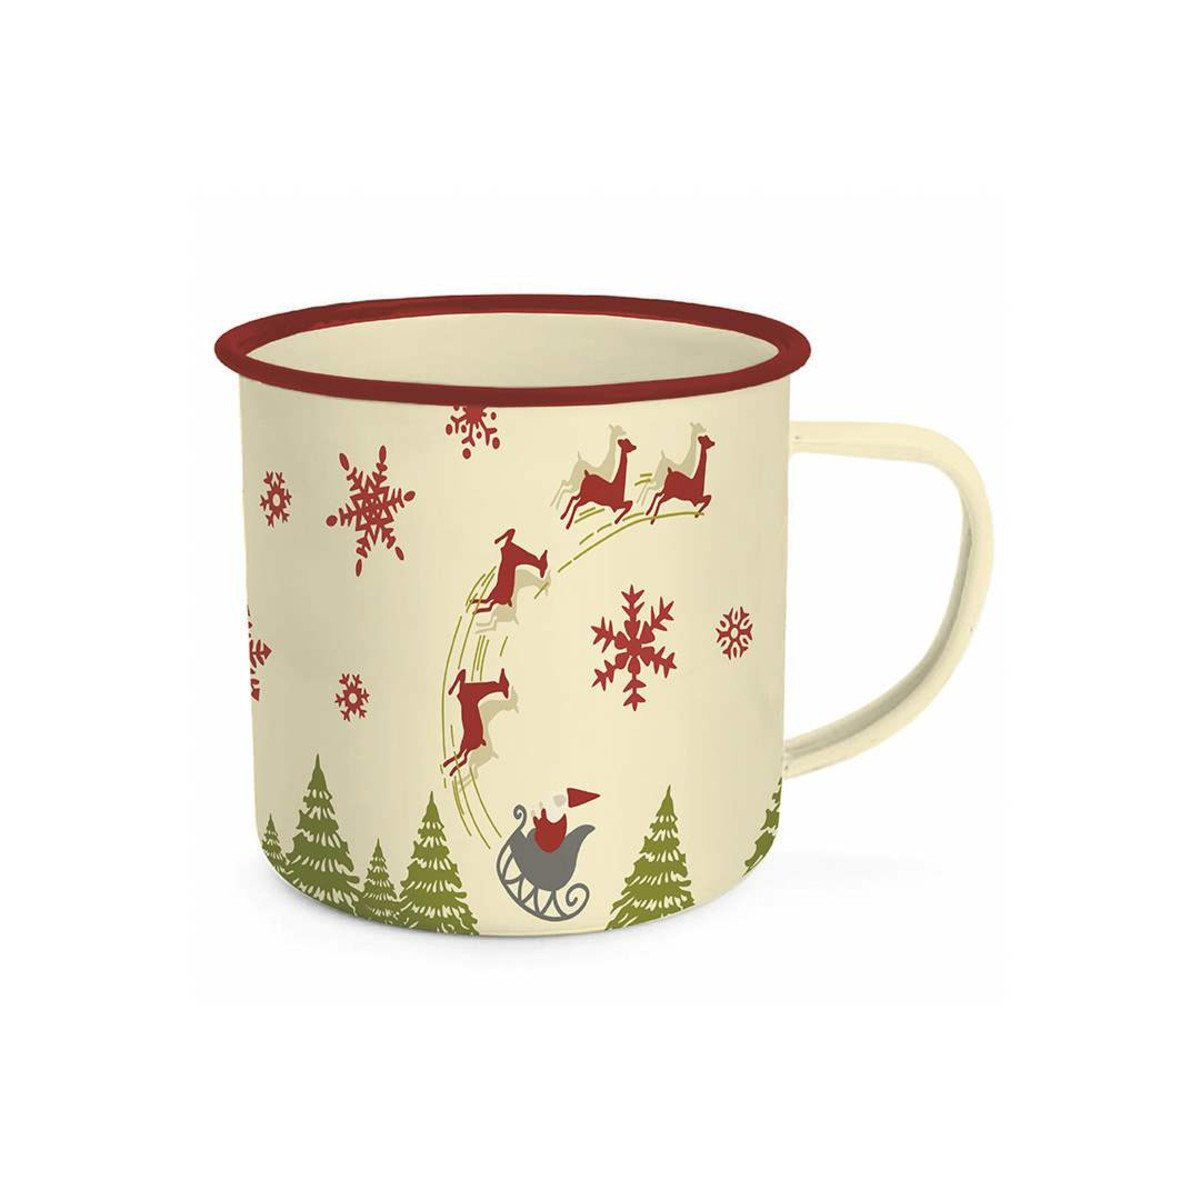 Stacy West Christmas Enamel Tin Mug (20 oz.)